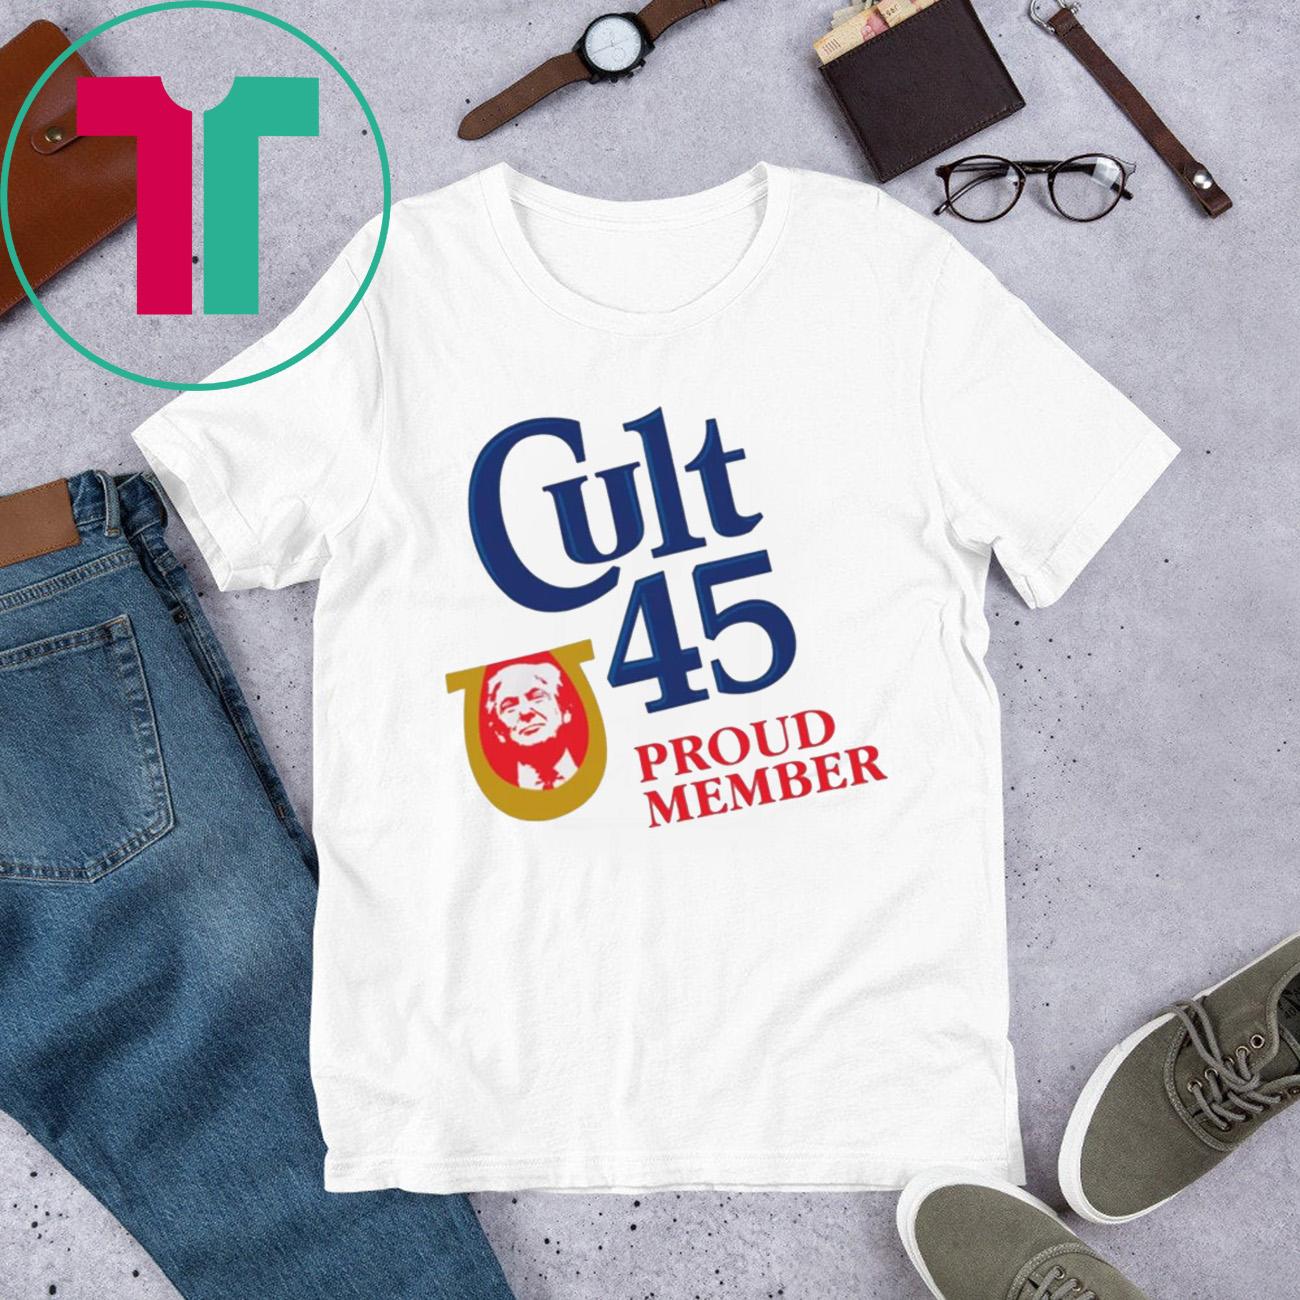 CULT 45 PROUD MEMBER TRUMP 2020 TSHIRT